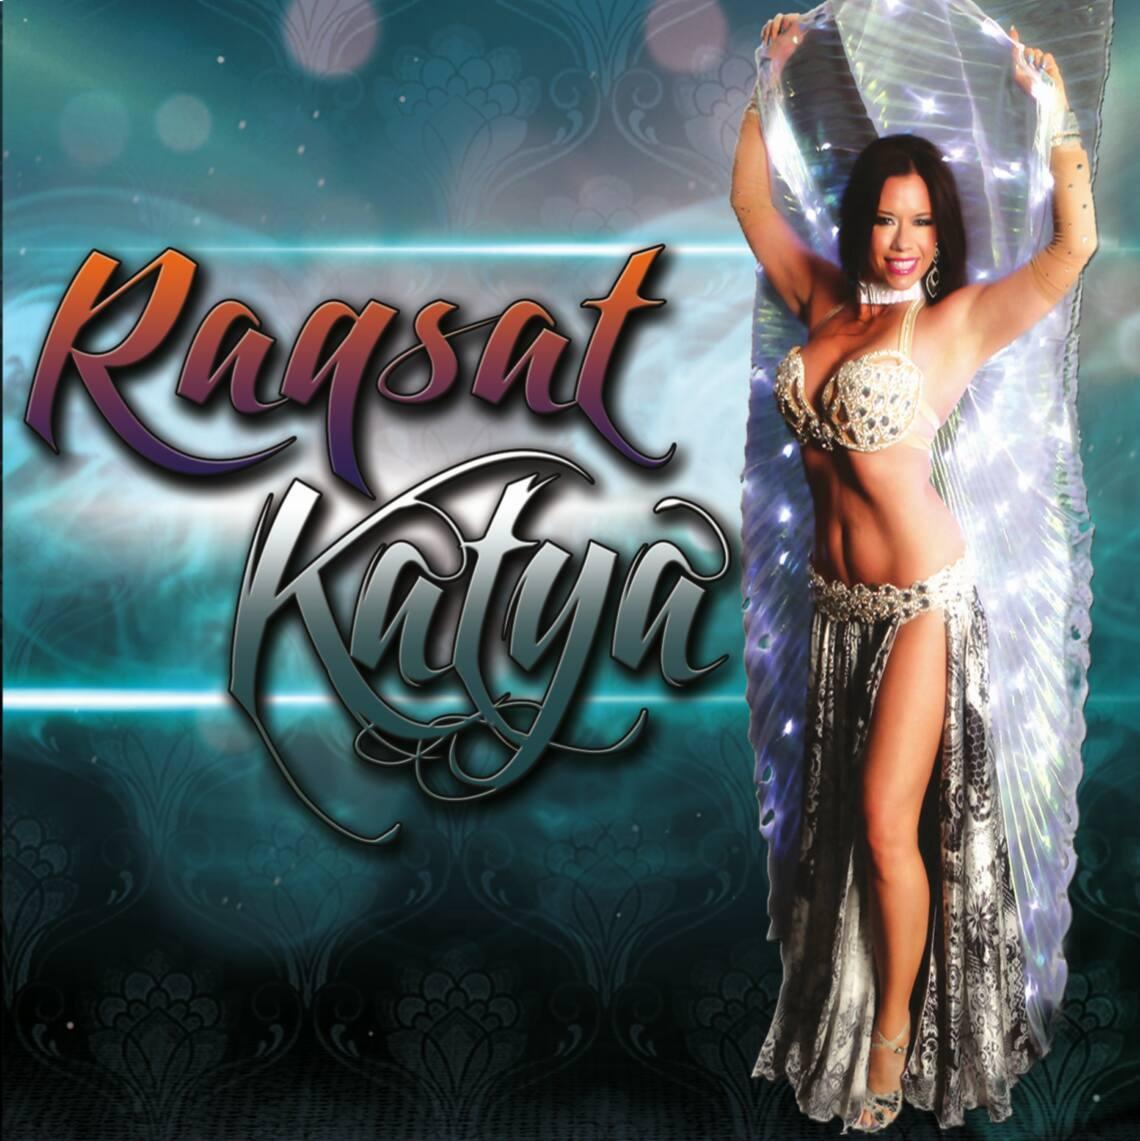 Raqsat Katya Merchandise Available